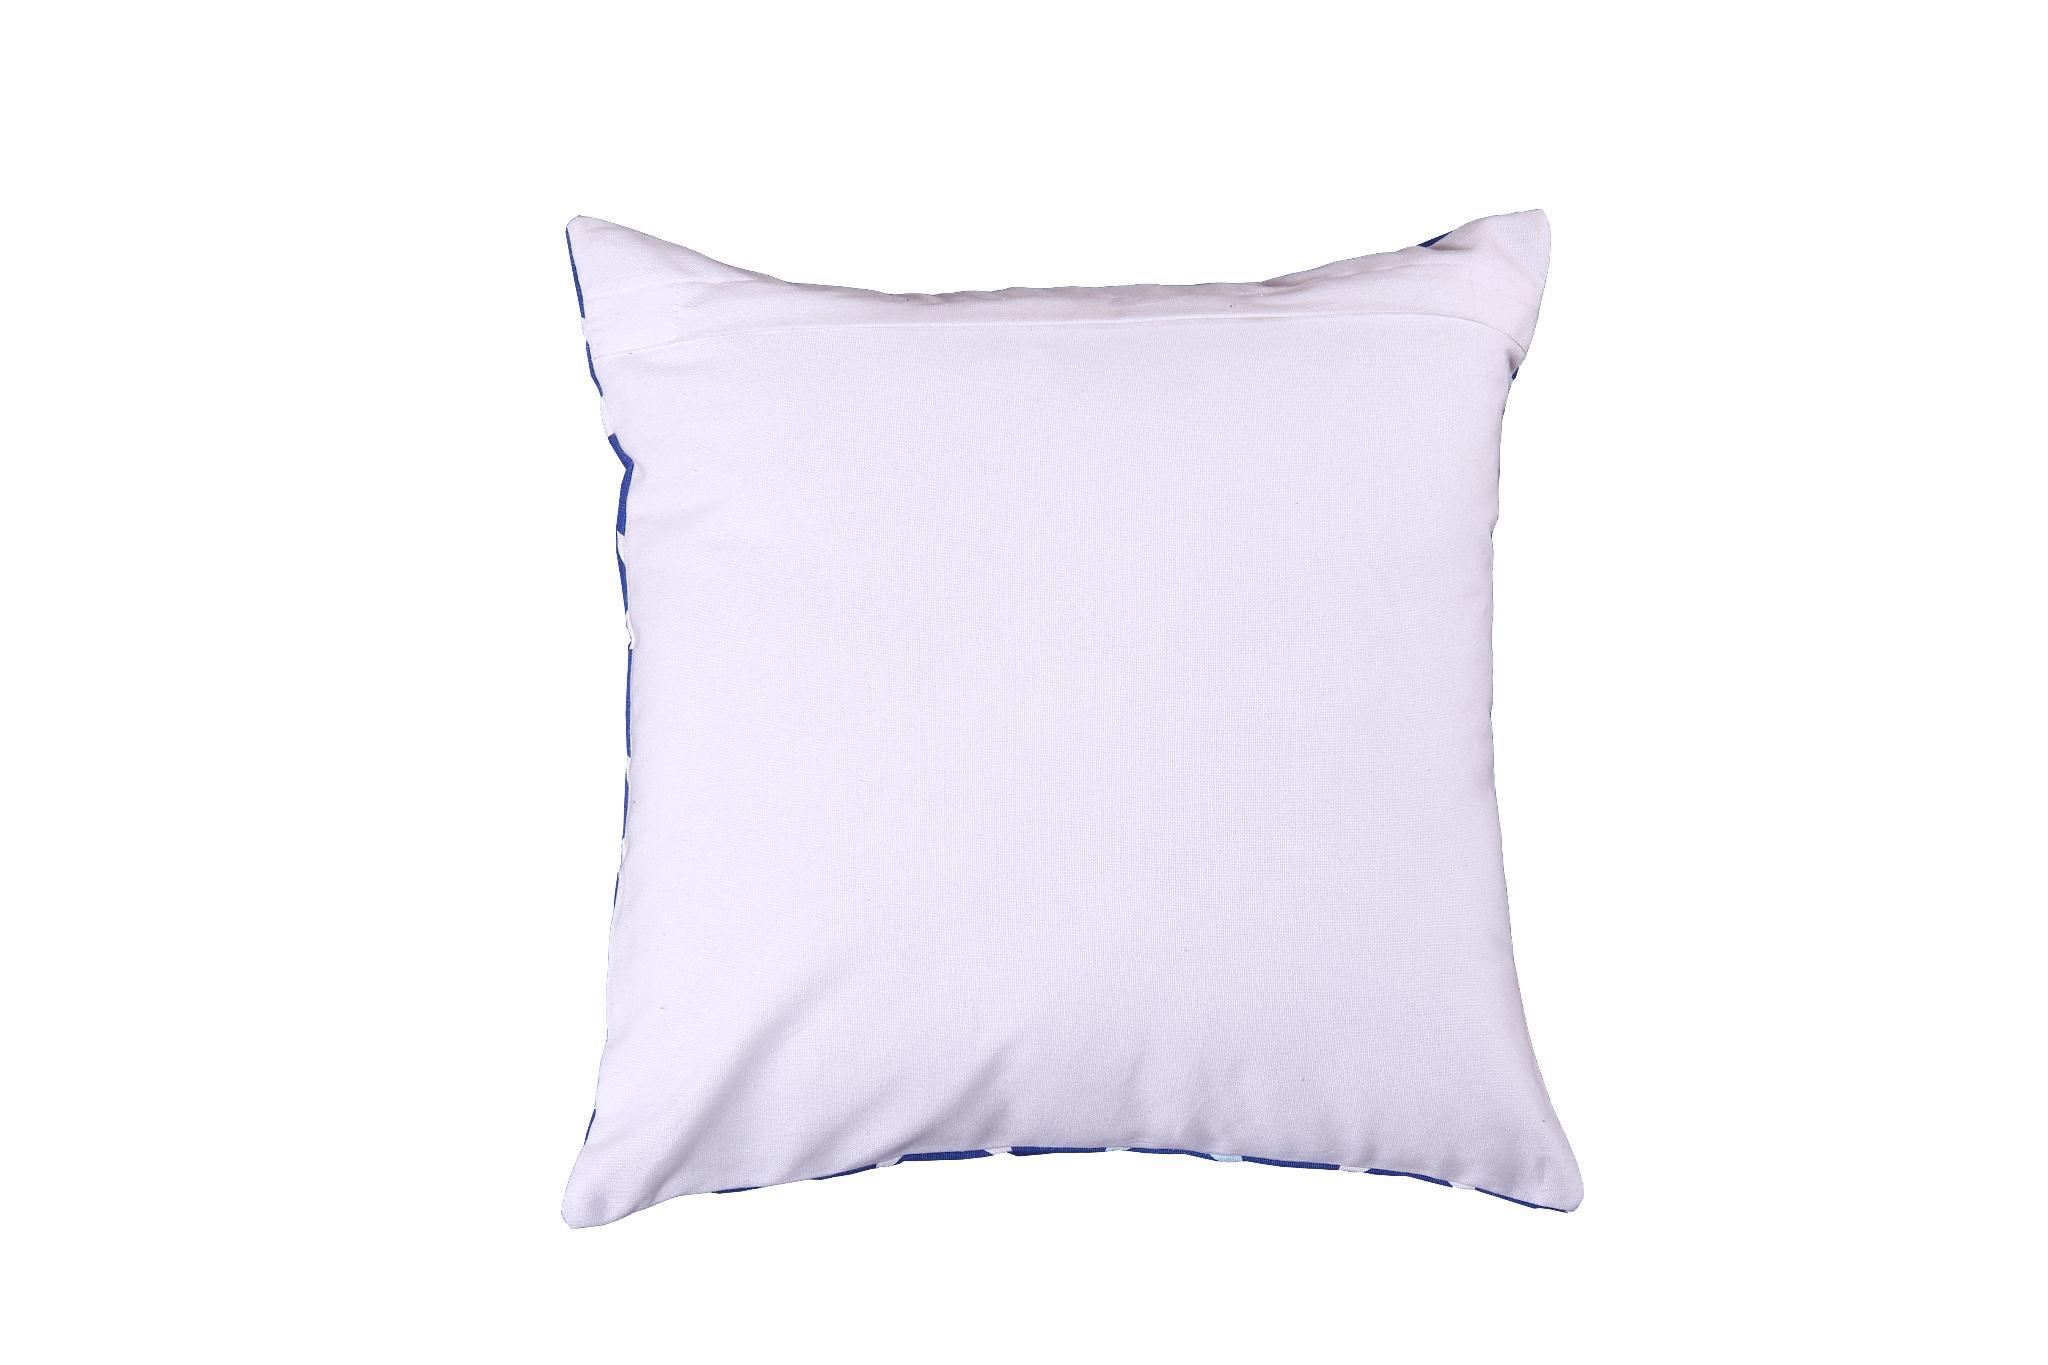 aratextil hogar coussin bleu toiles rouges blanches et. Black Bedroom Furniture Sets. Home Design Ideas